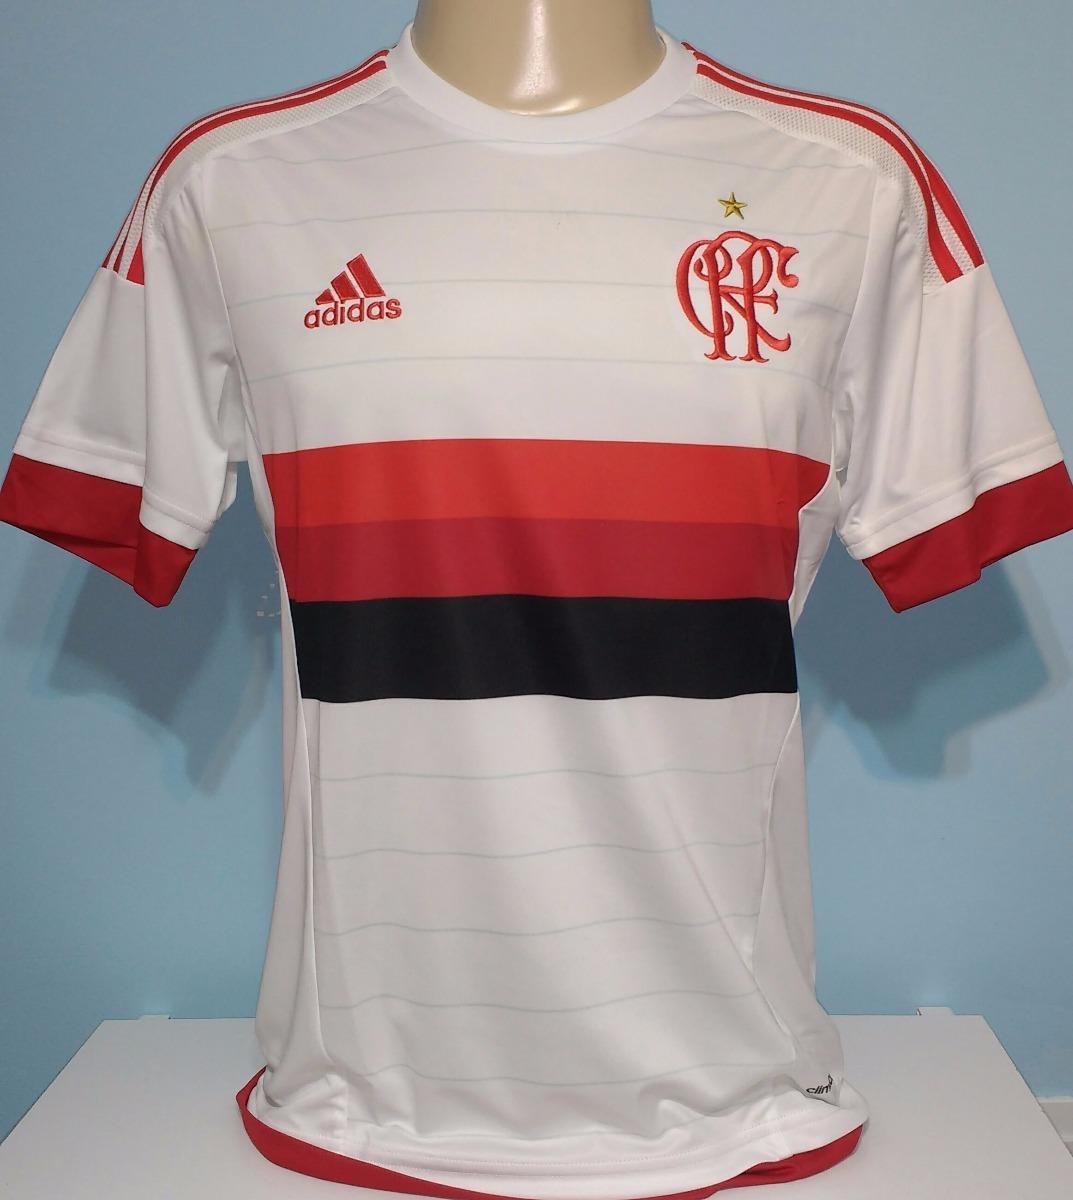 059d6a6eac Camisa Flamengo 2015 / 2016 Branca 100% Original adidas - 20 - R ...